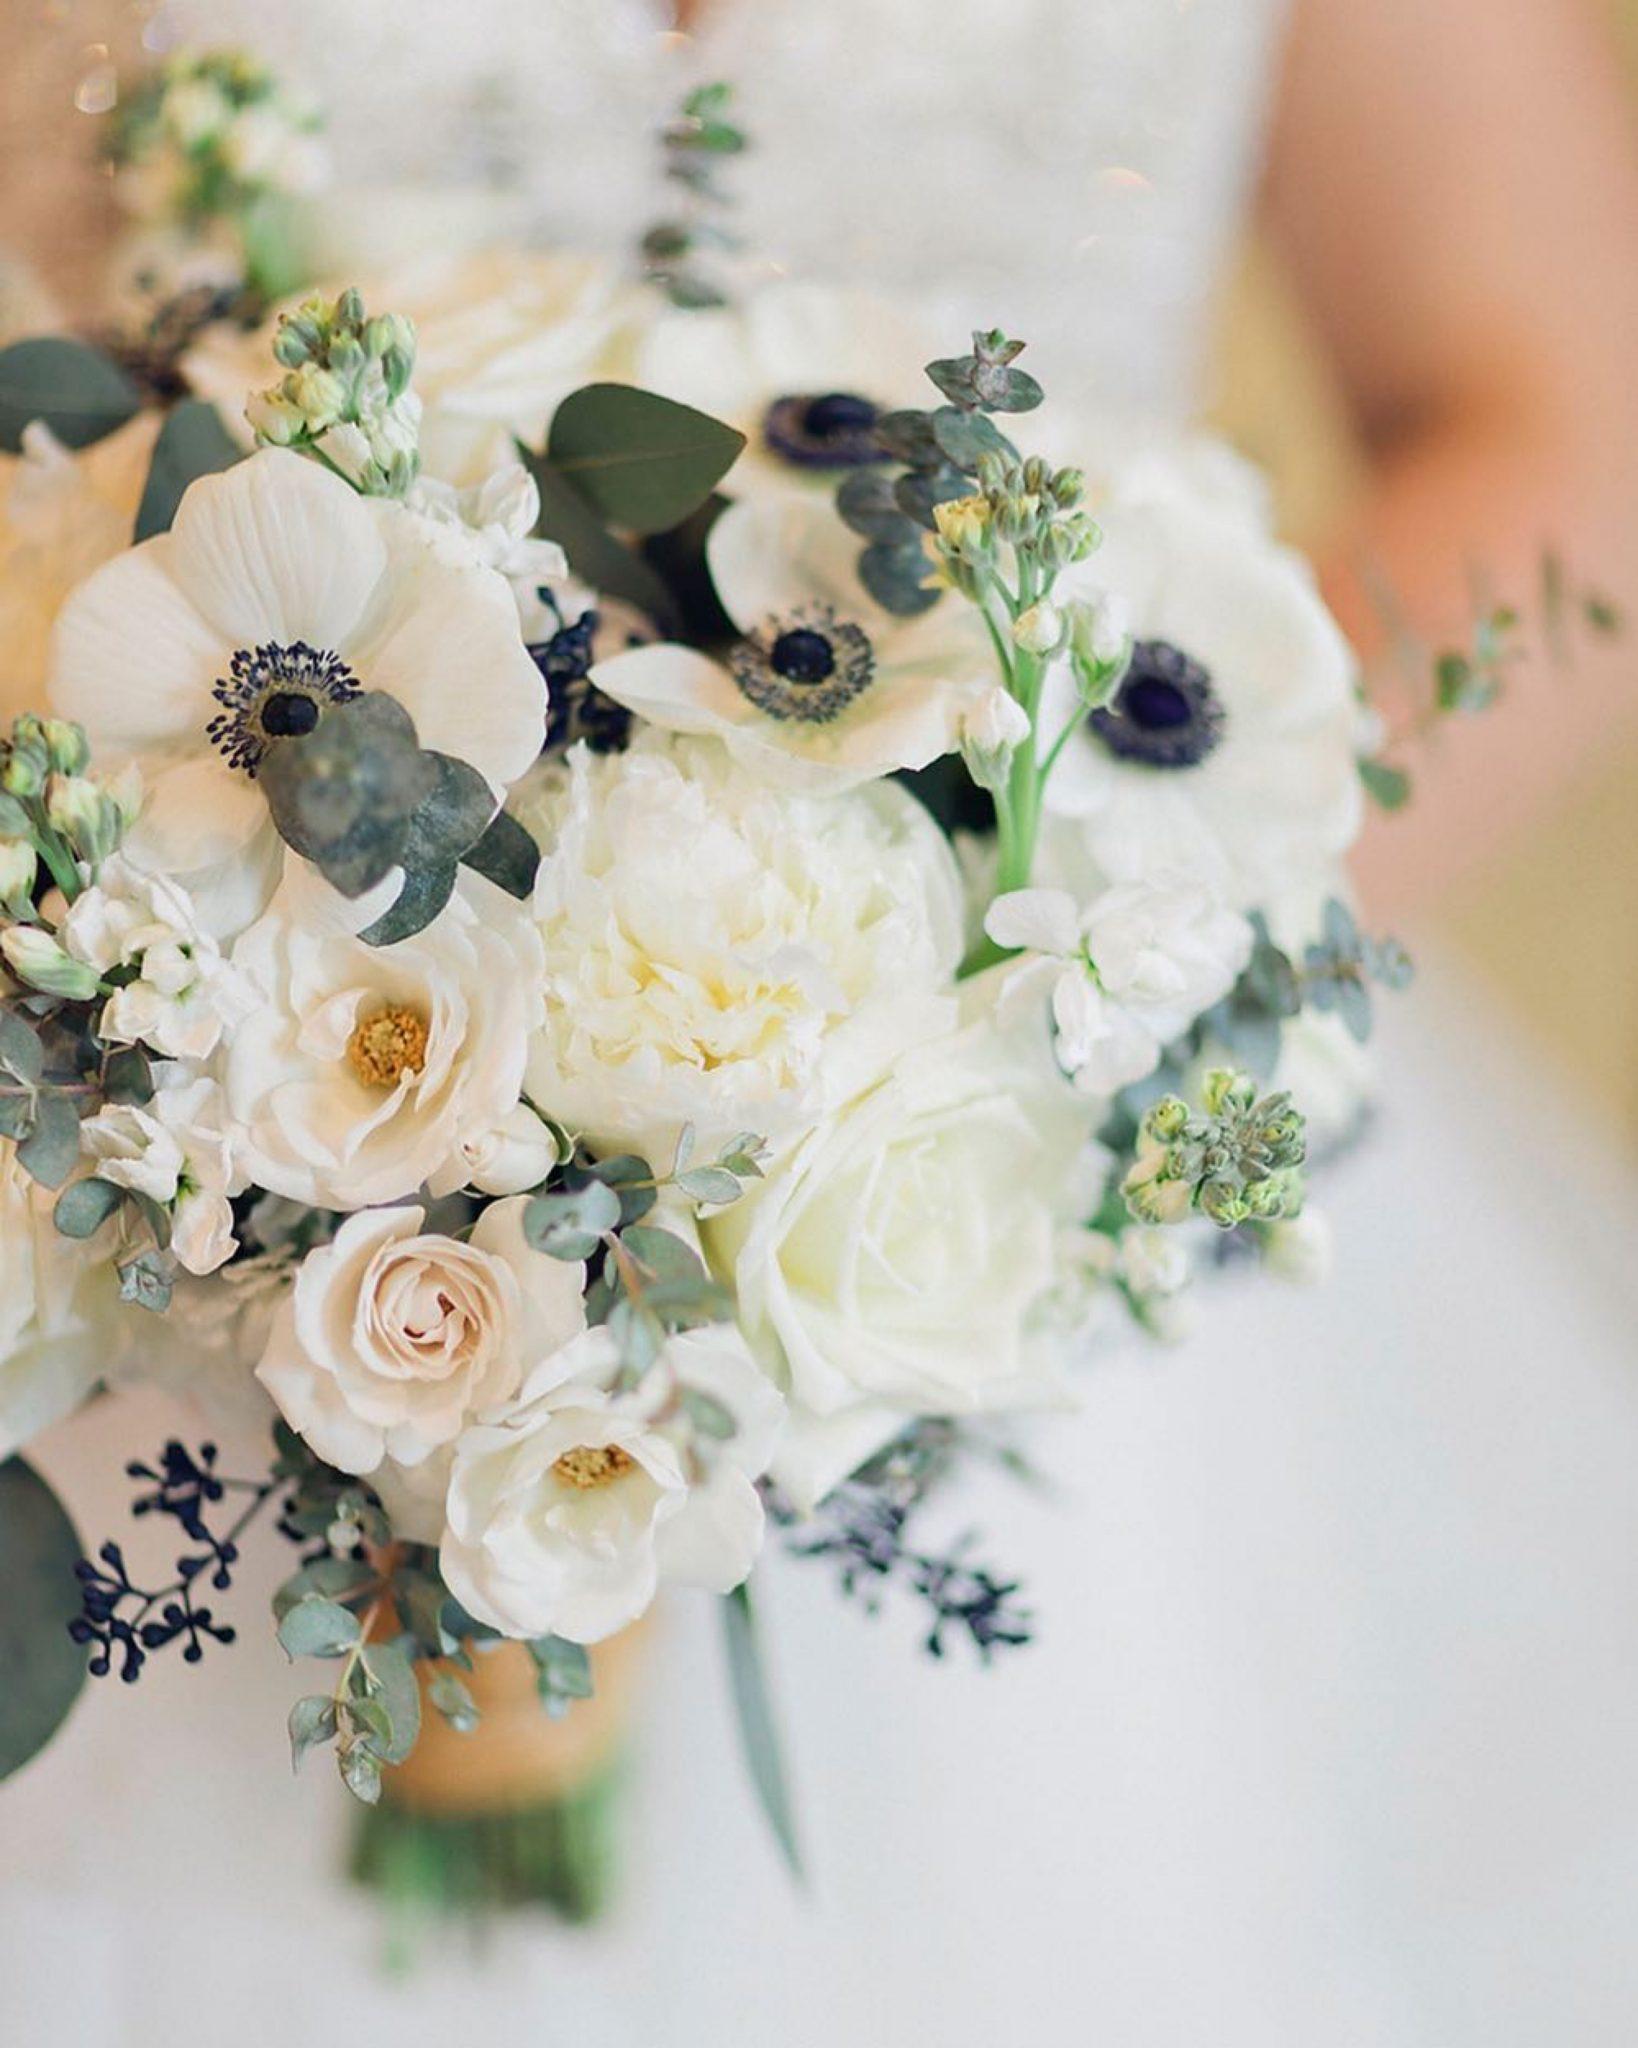 bridal_bouquet_brides_wedding_Flowers_dayton_florist_cincinnati_florist_wedding_flowers_Dayton_ohio_white_wedding_Bouquet_dayton_bride